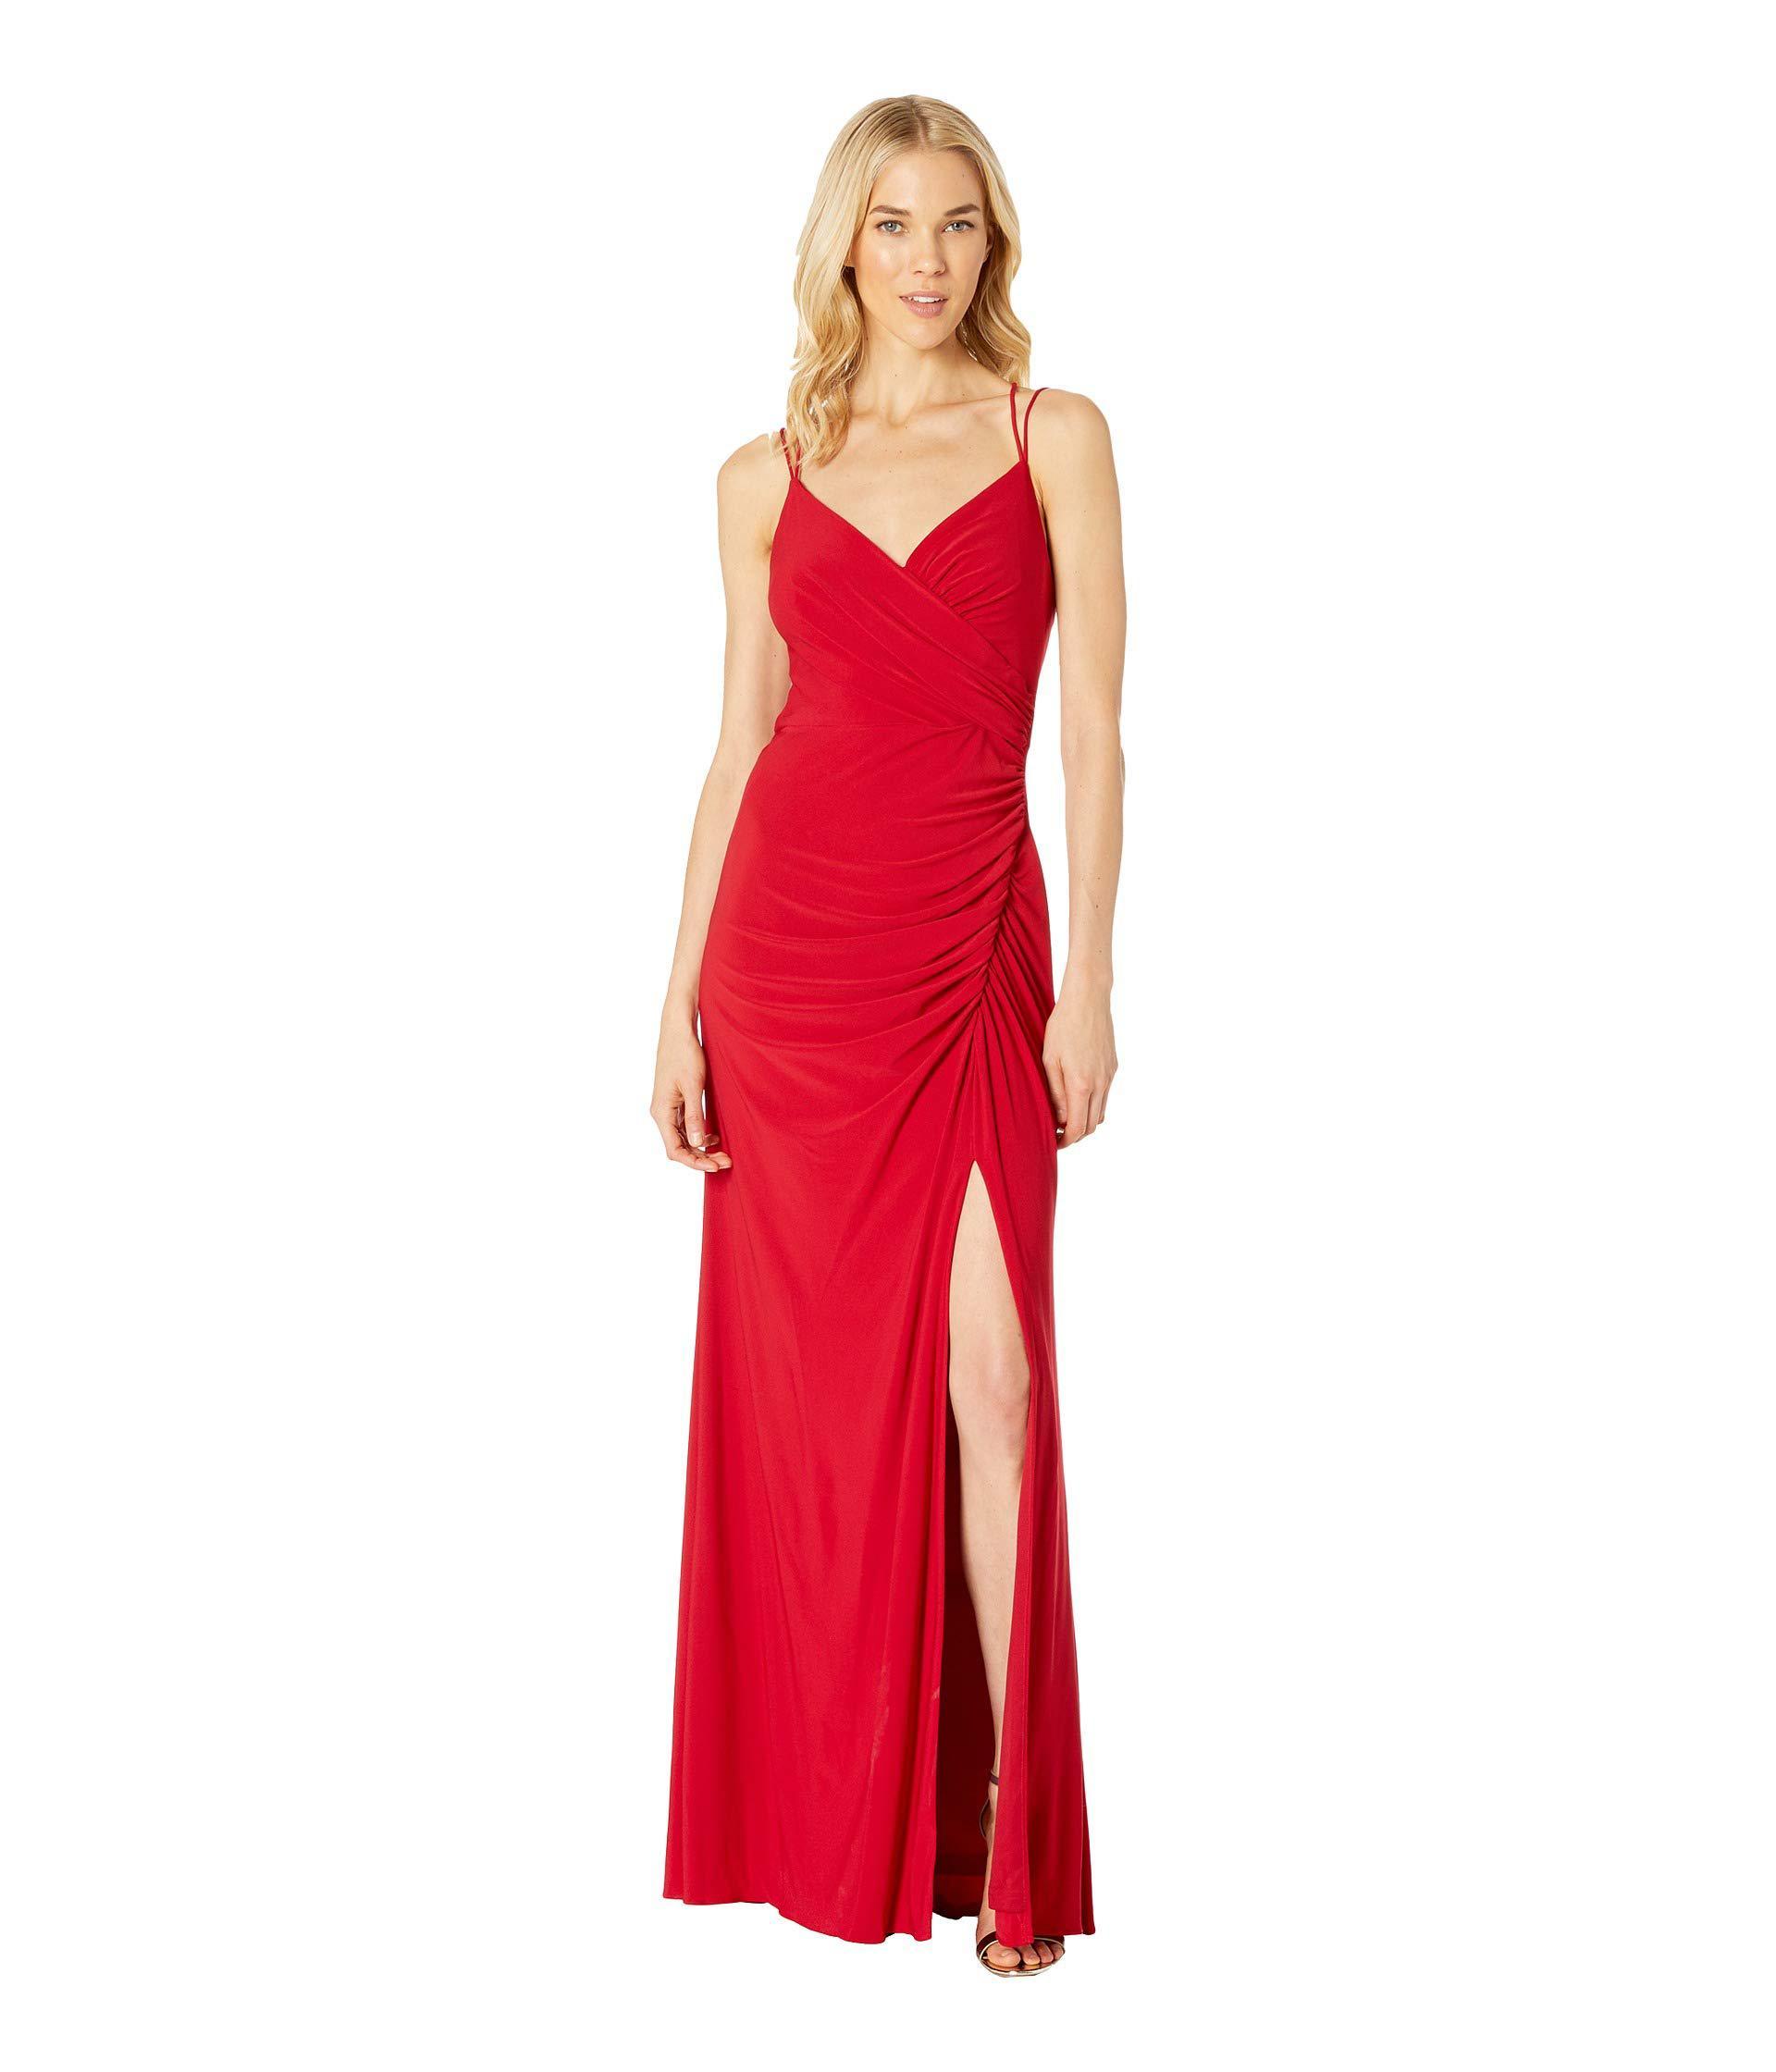 a6ad779b9a047 Lyst - Adrianna Papell Jersey Long Dress (cardinal) Women s Dress in Red